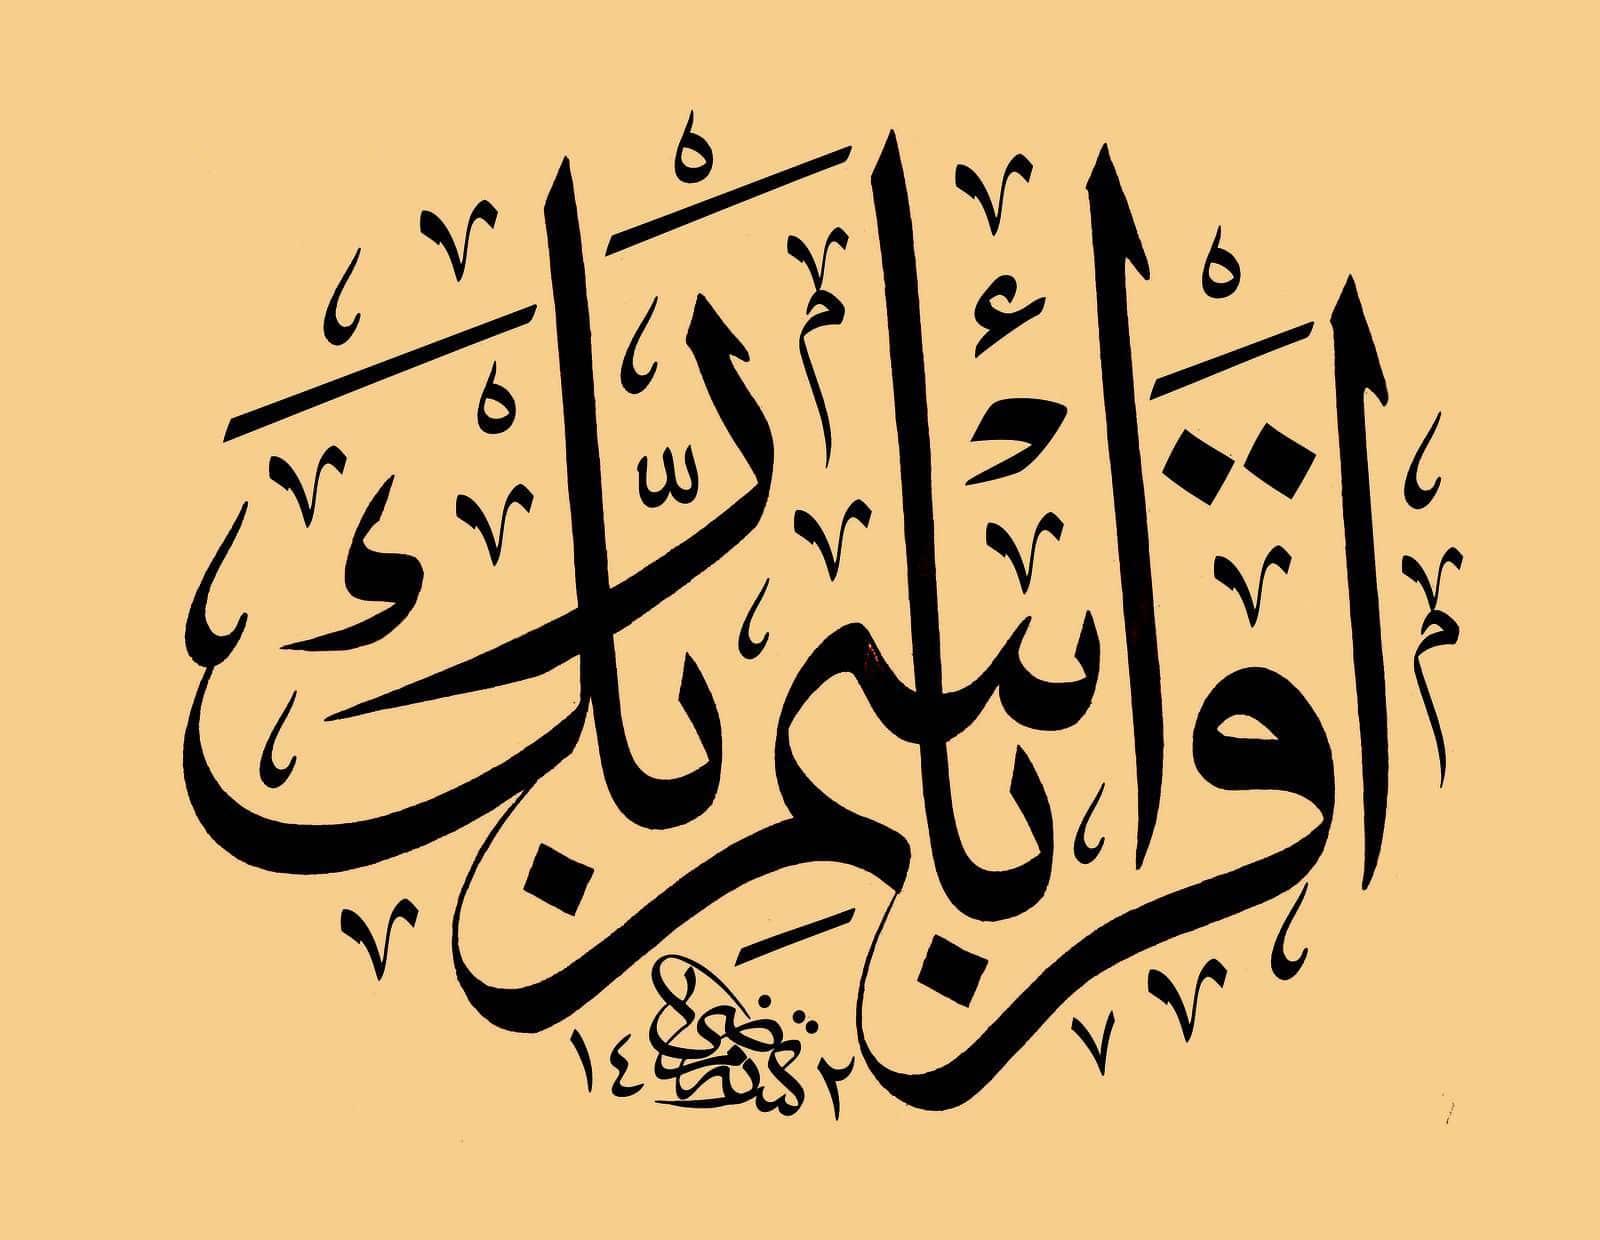 Online Islamic Calligraphy Image